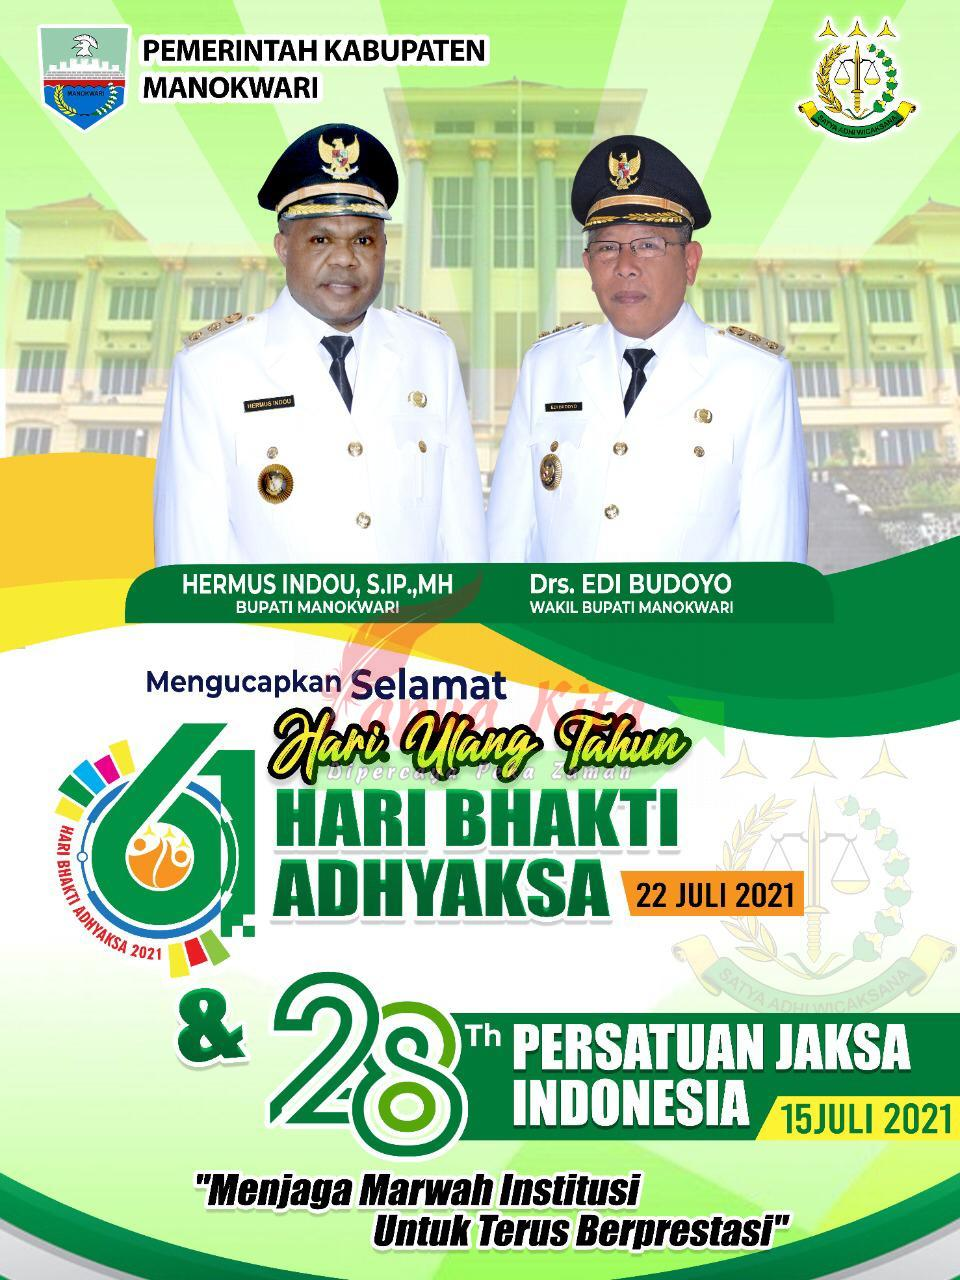 Hari_Ulang_Tahun_Hari_Bhakti_Adhyaksa_Dan_Persatuan_Jaksa_Indonesia_Manokwari